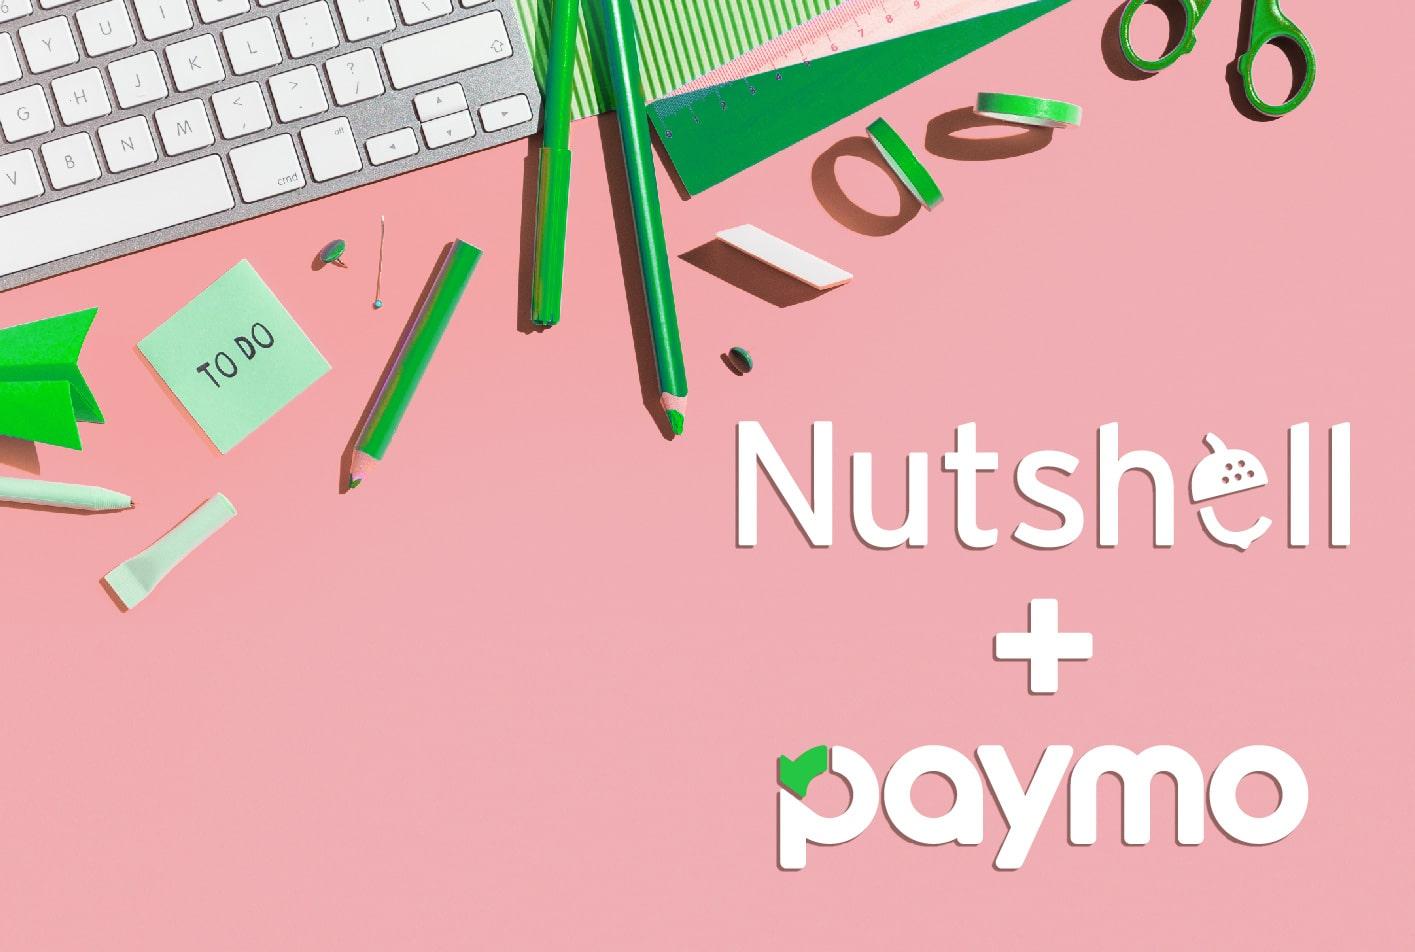 paymo project management software nutshell discount work management platform